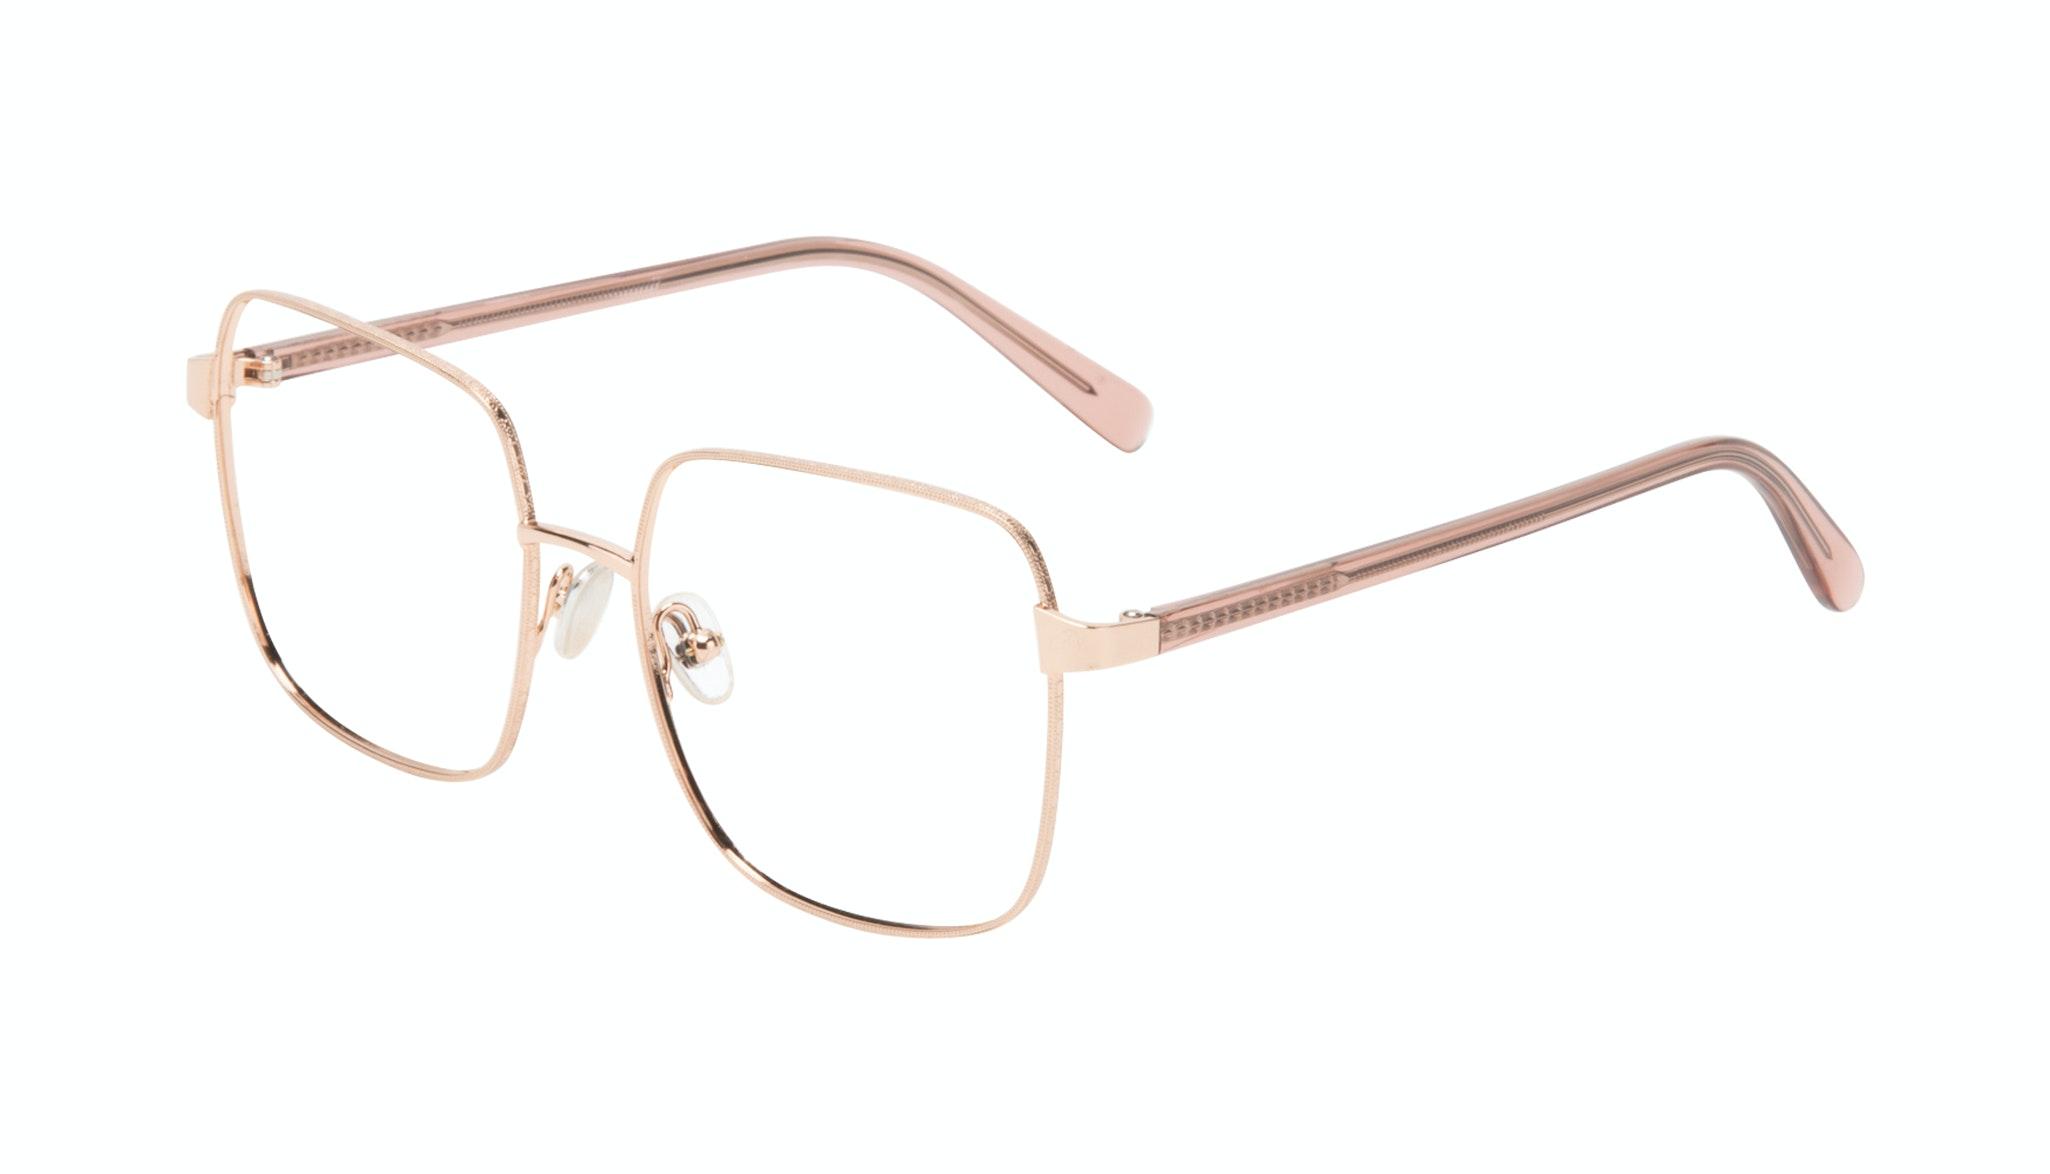 Affordable Fashion Glasses Square Eyeglasses Women Fab Rose Tilt